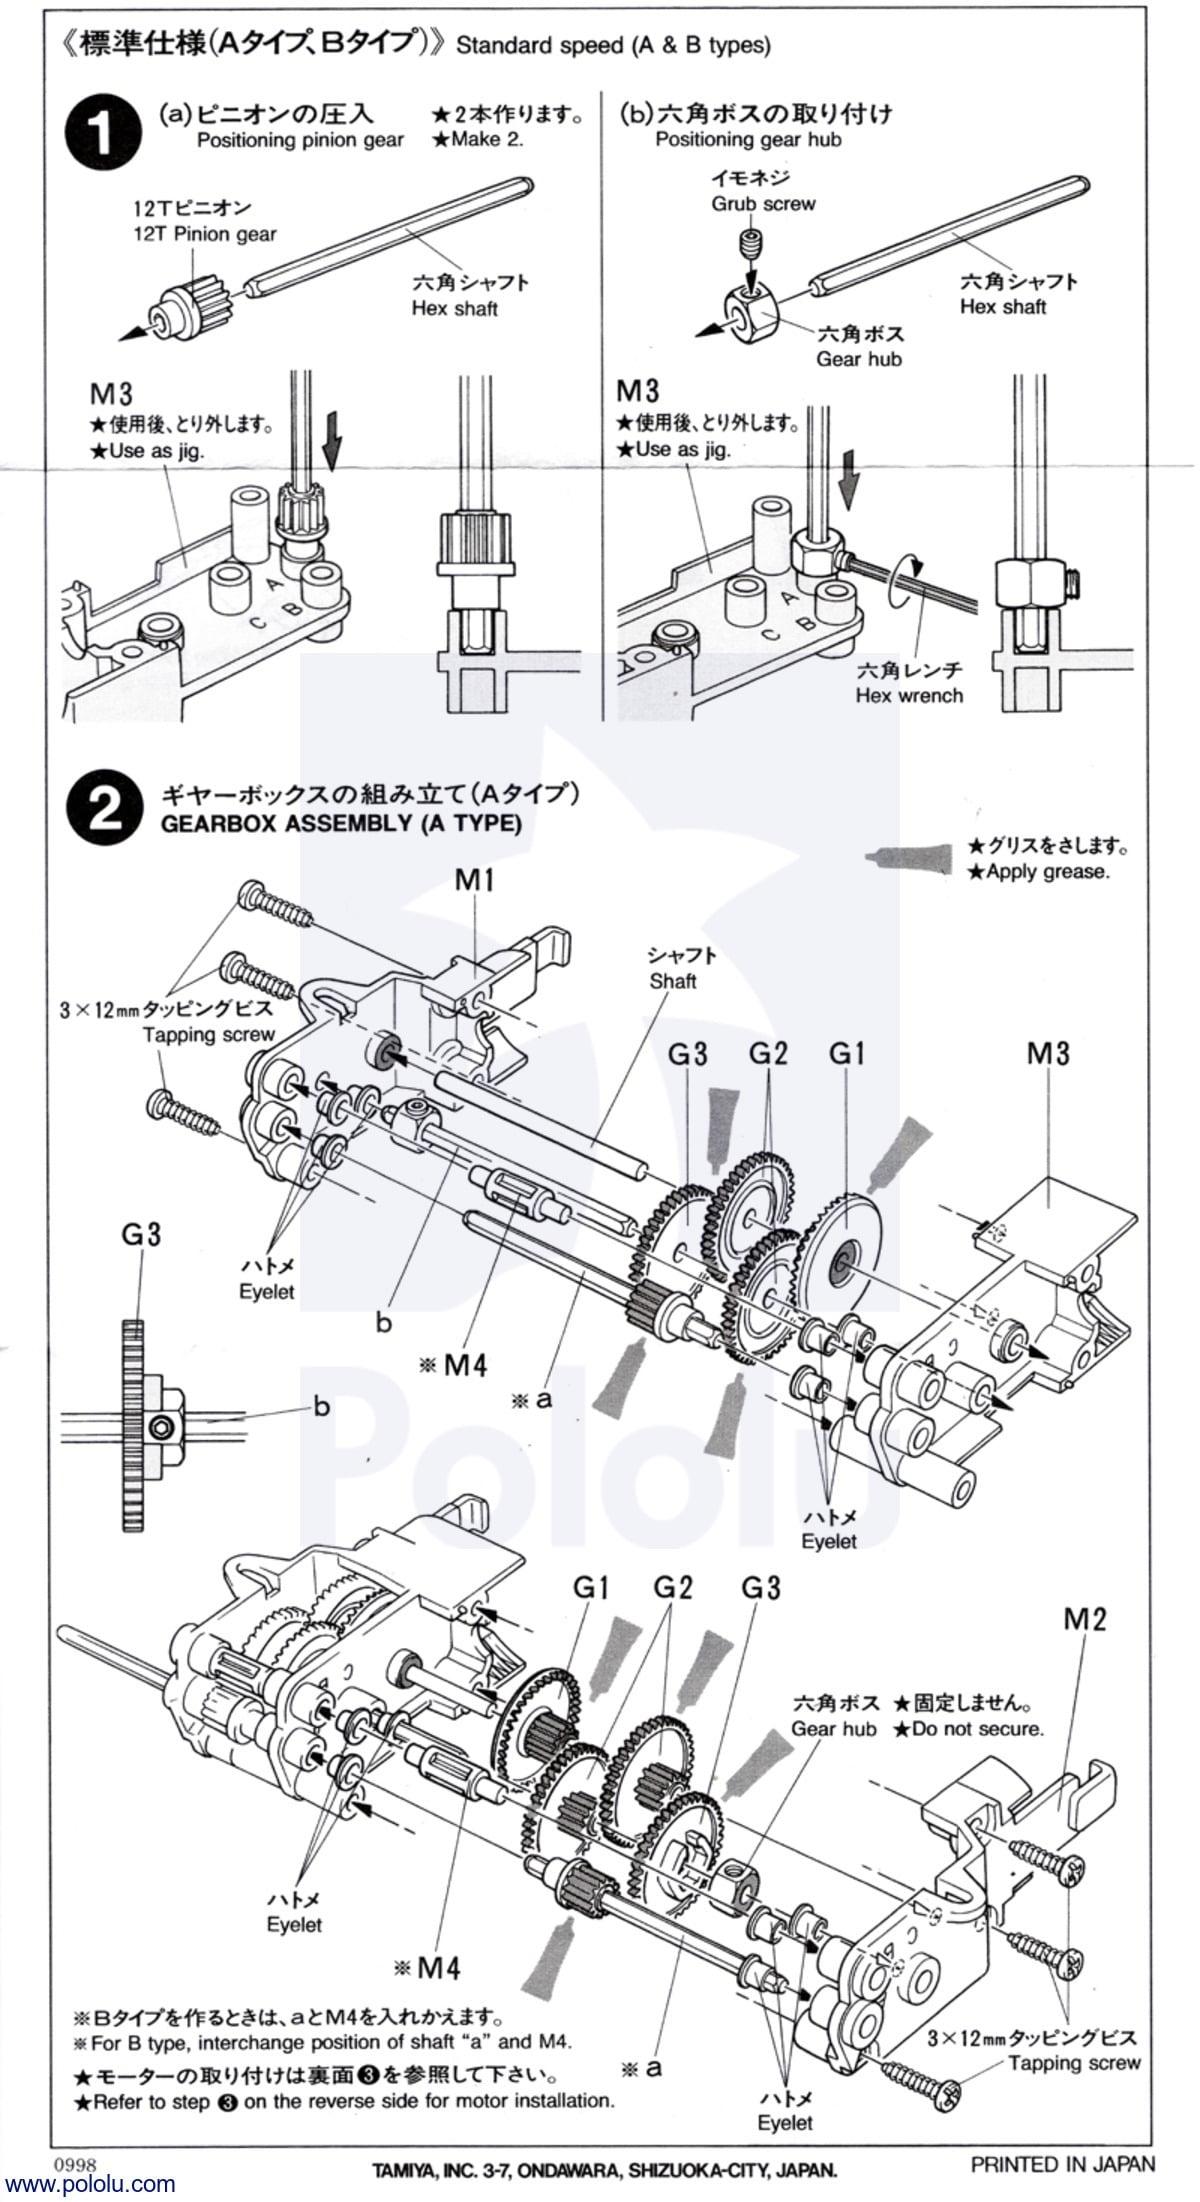 Tamiya Twin Motor Gearbox Kit